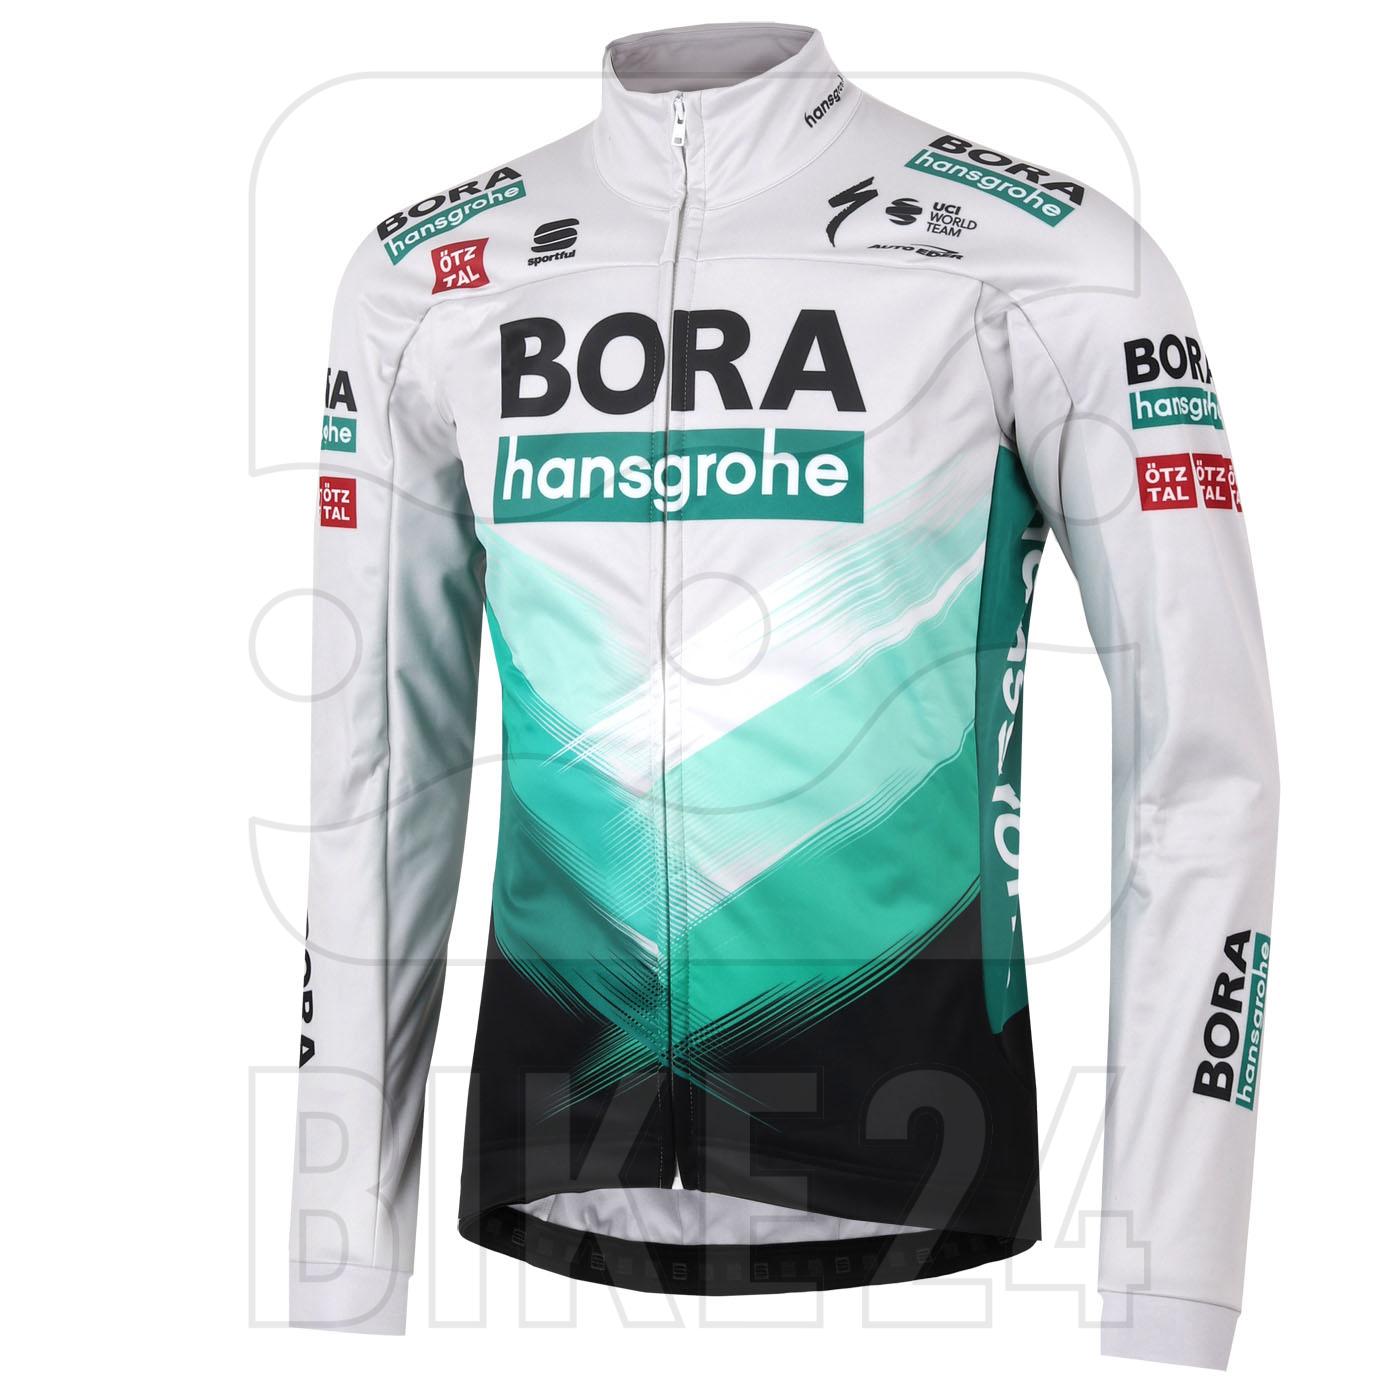 Sportful BORA hansgrohe Partial Protection Jacket - 057 Green-Grey